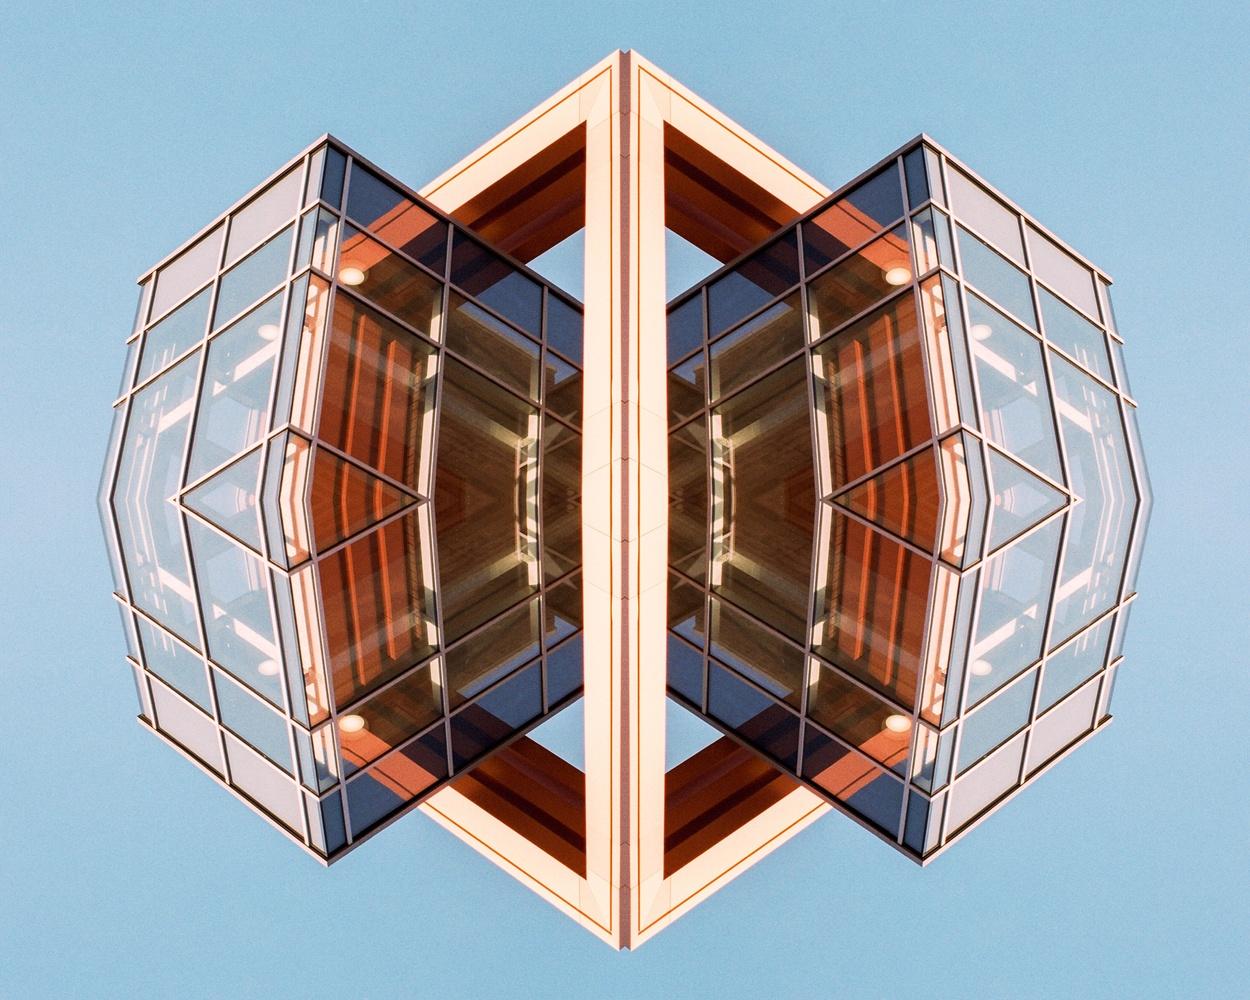 Other Worlds by Valentin Rizvan